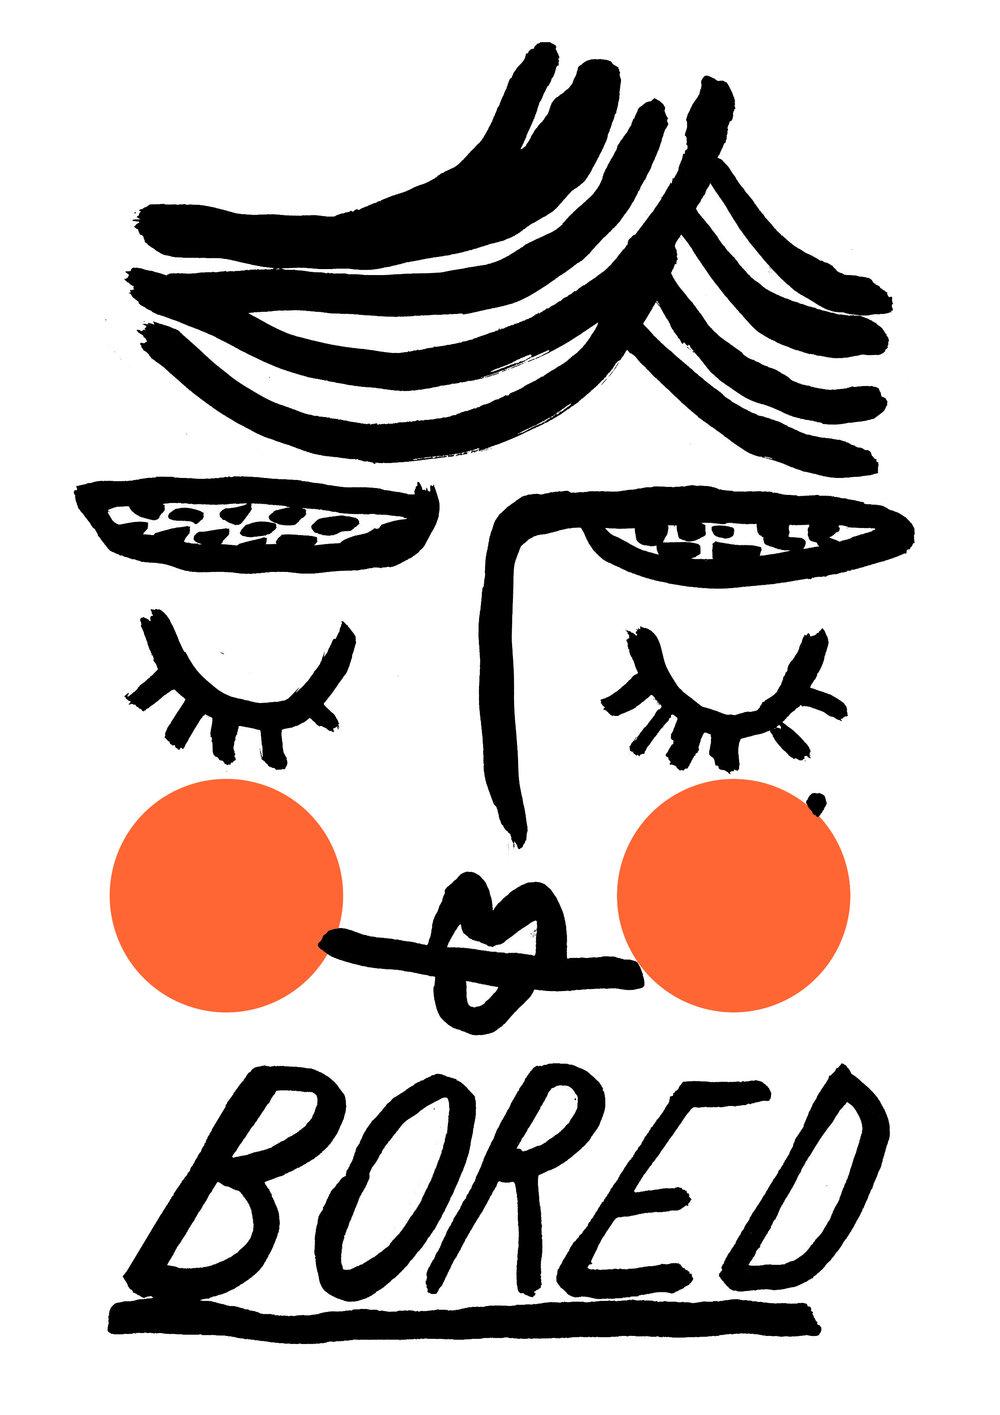 bored-face-orange - Sarah Vignon.jpg